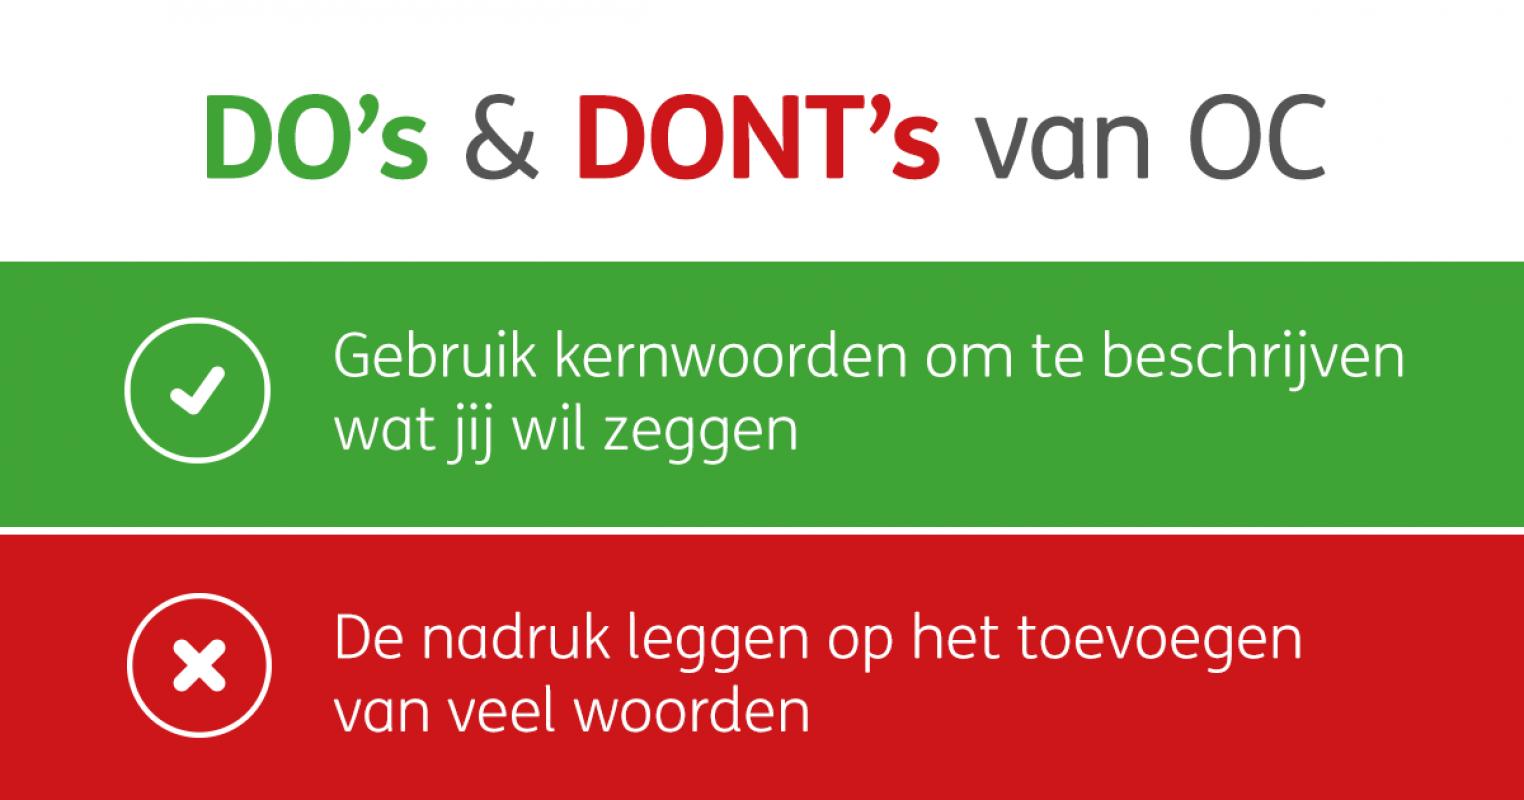 Do's & Don'ts van OC